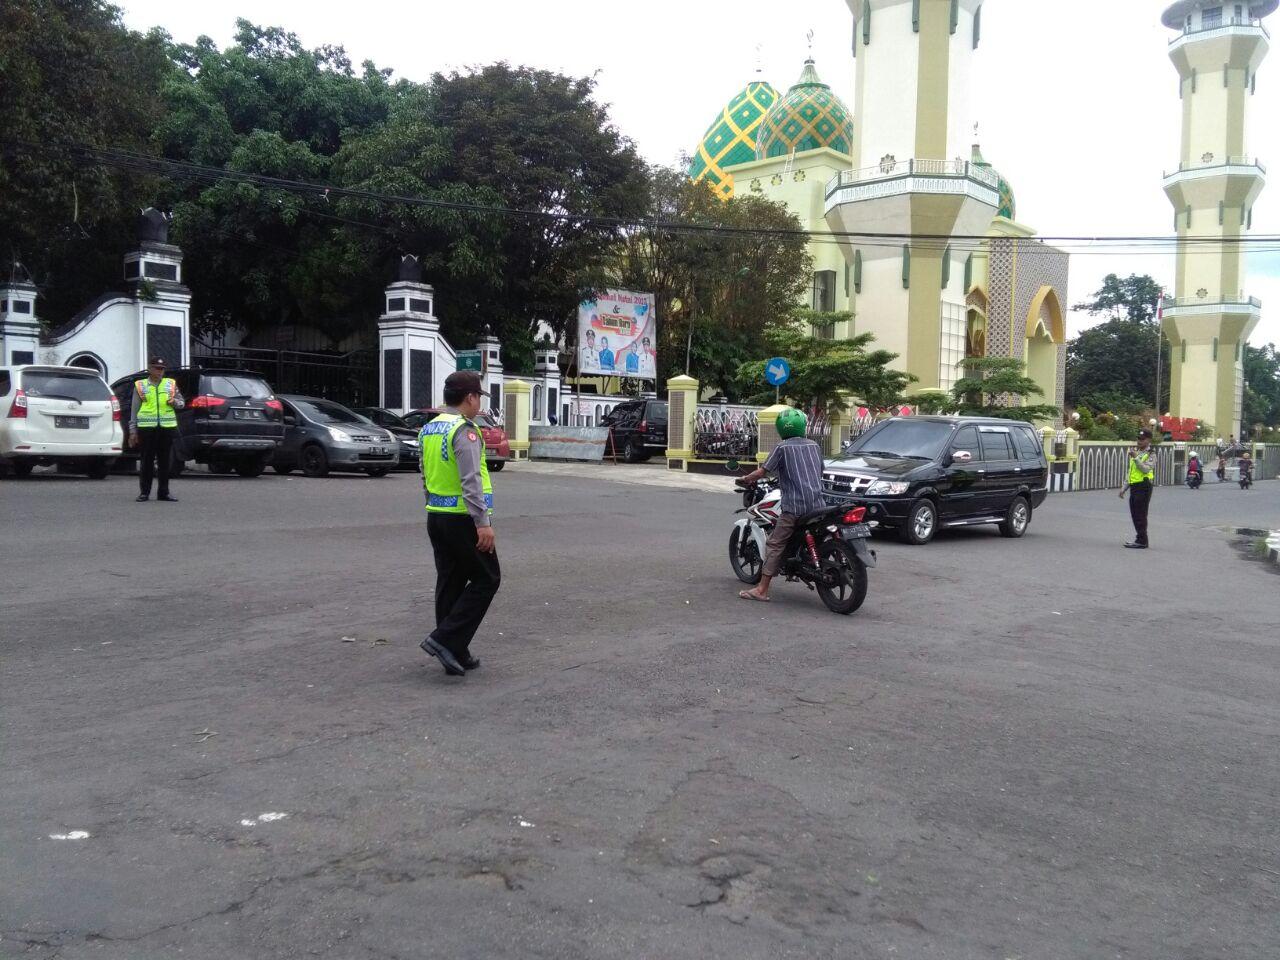 Sholat Jumat Masjid Agung Baitussalam Magetan Diamankan Polisi Ditempat Terpisah